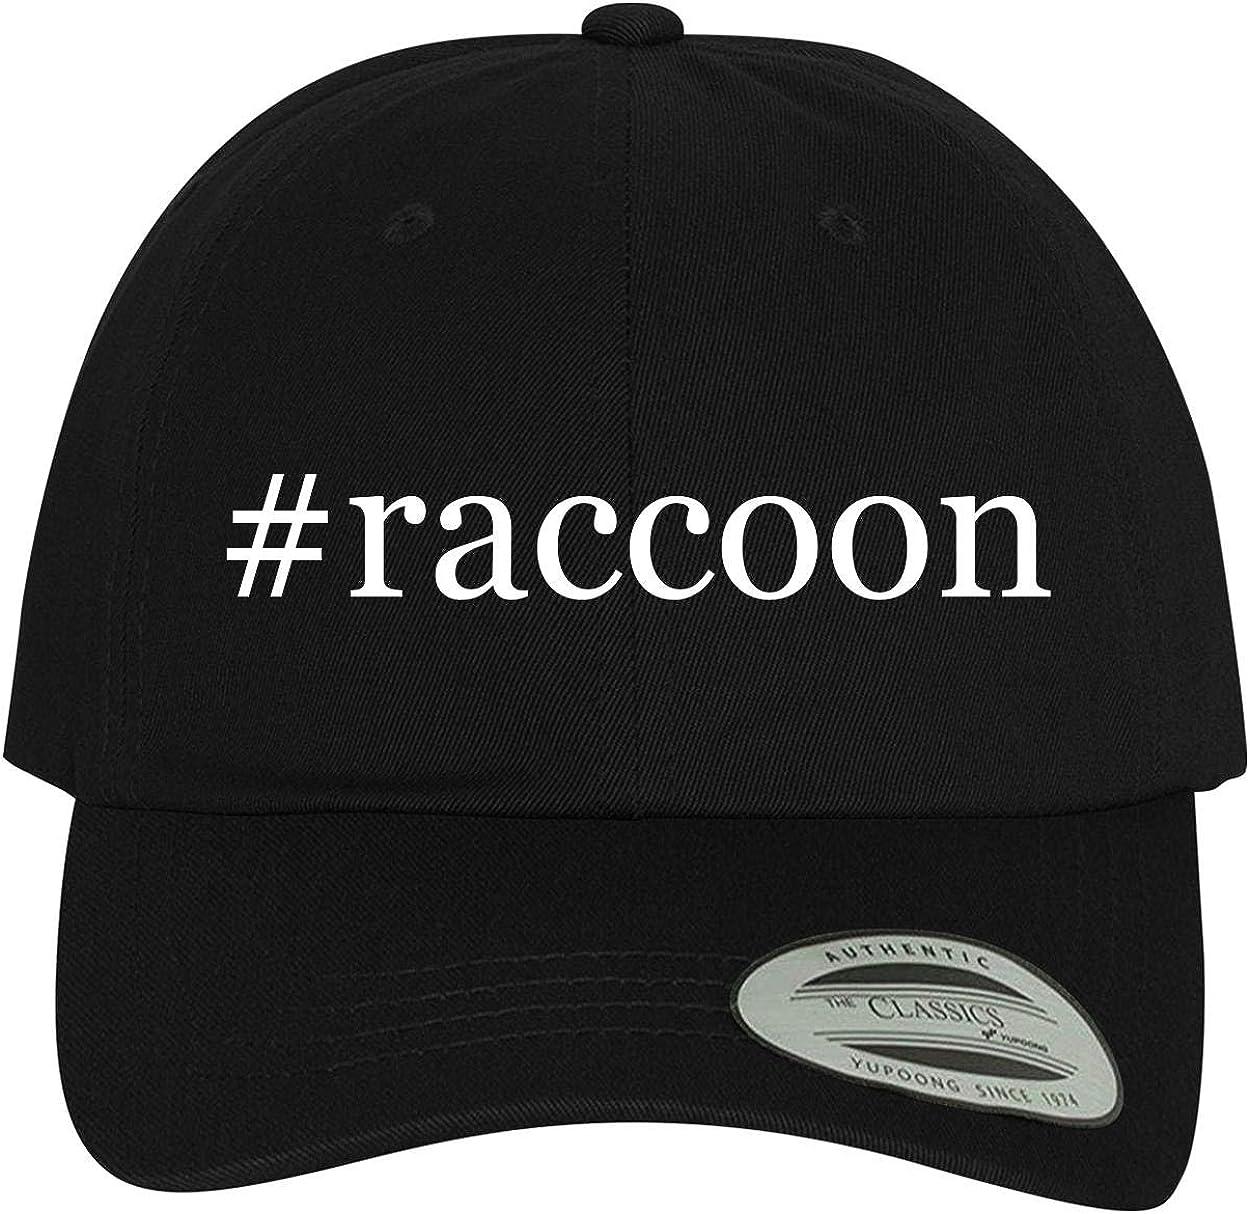 Comfortable Dad Hat Baseball Cap BH Cool Designs #Raccoon